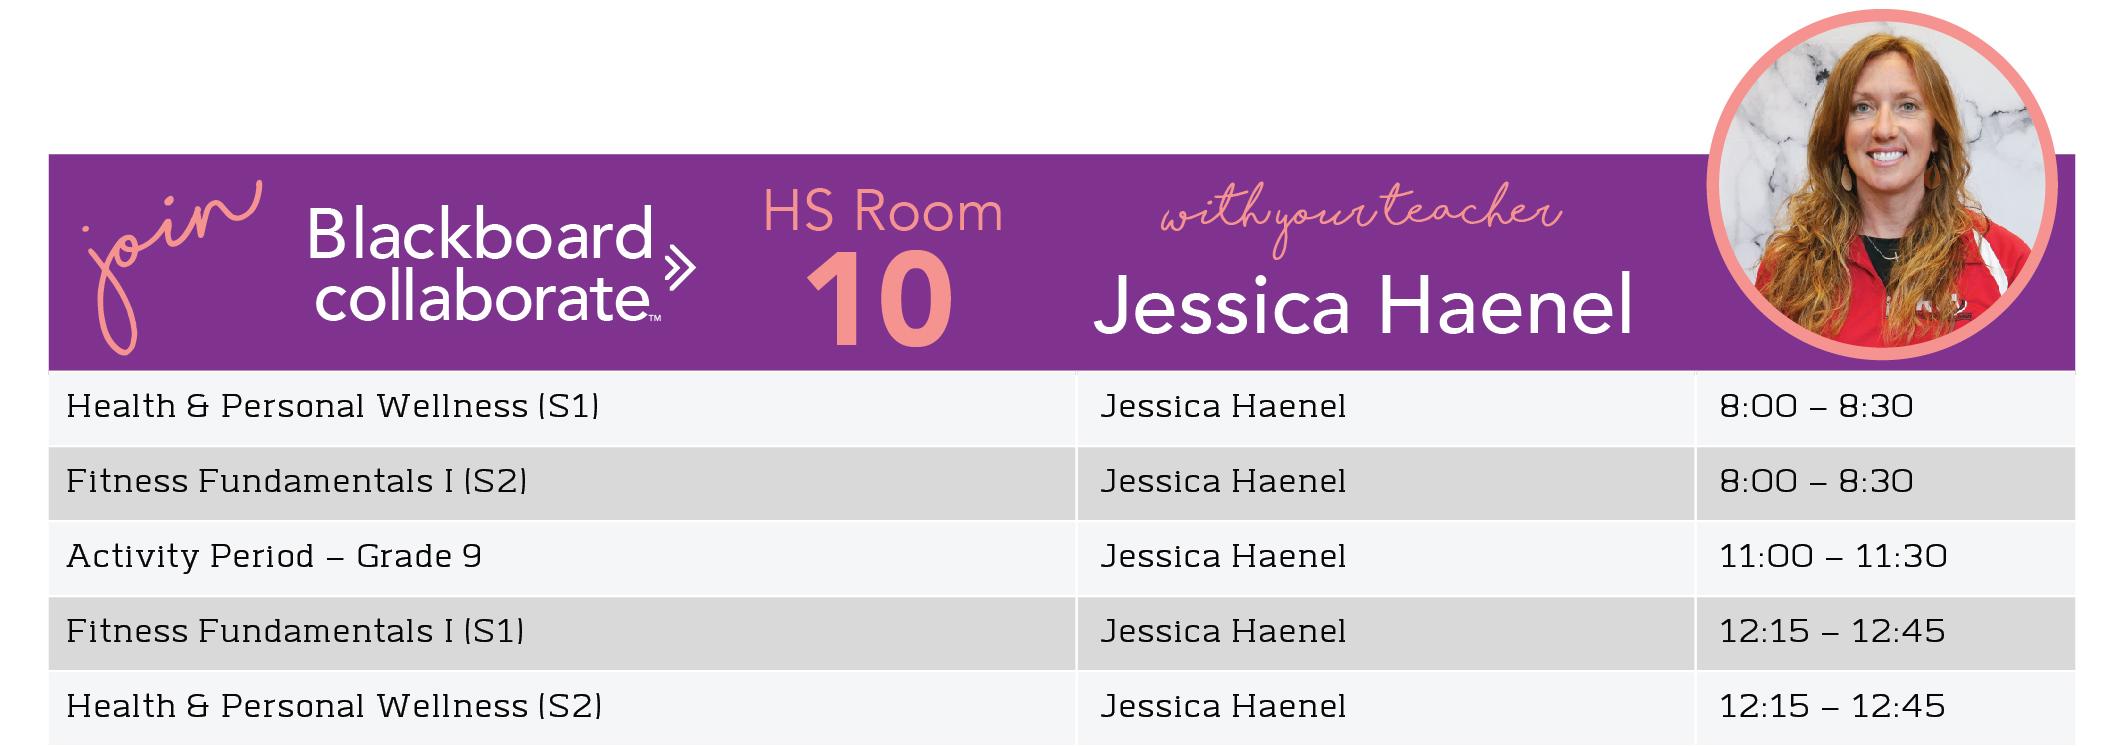 Blackboard HS Buttons 2019-20-10.jpg